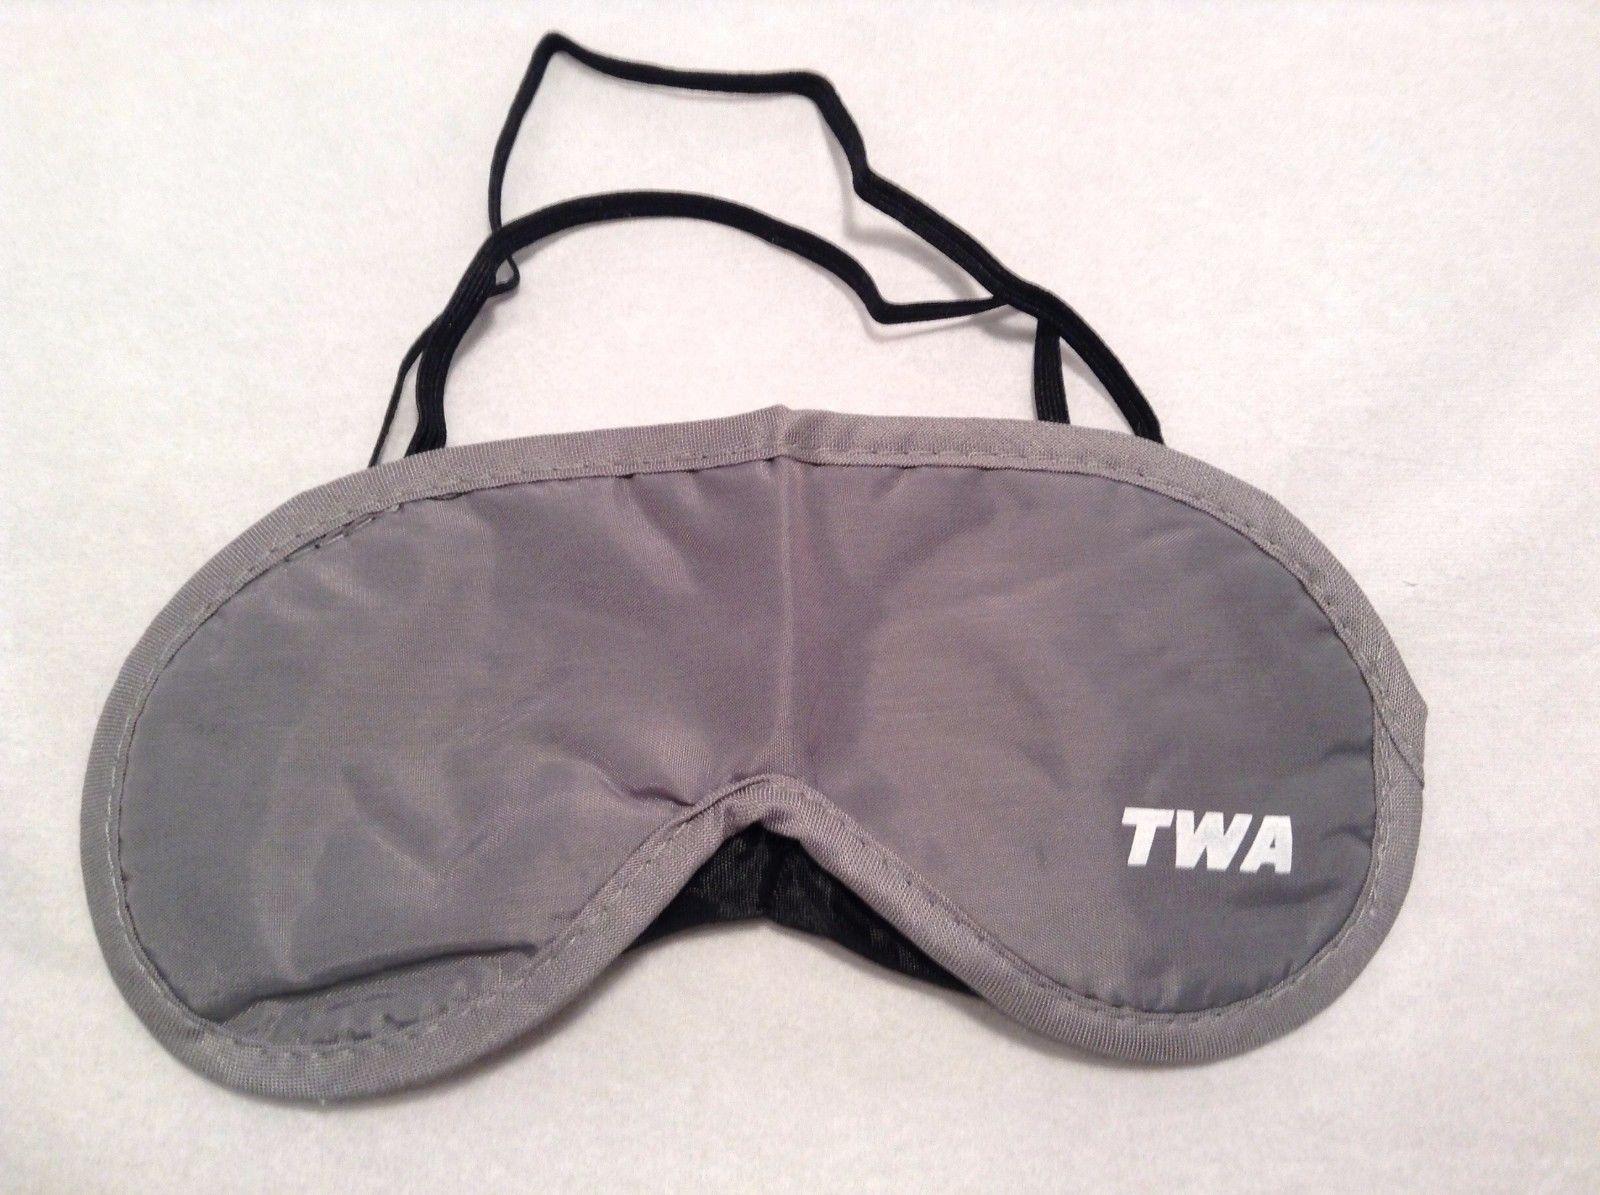 New TWA Eye Mask Elastic Band Back Sleep Mask Dark Gray